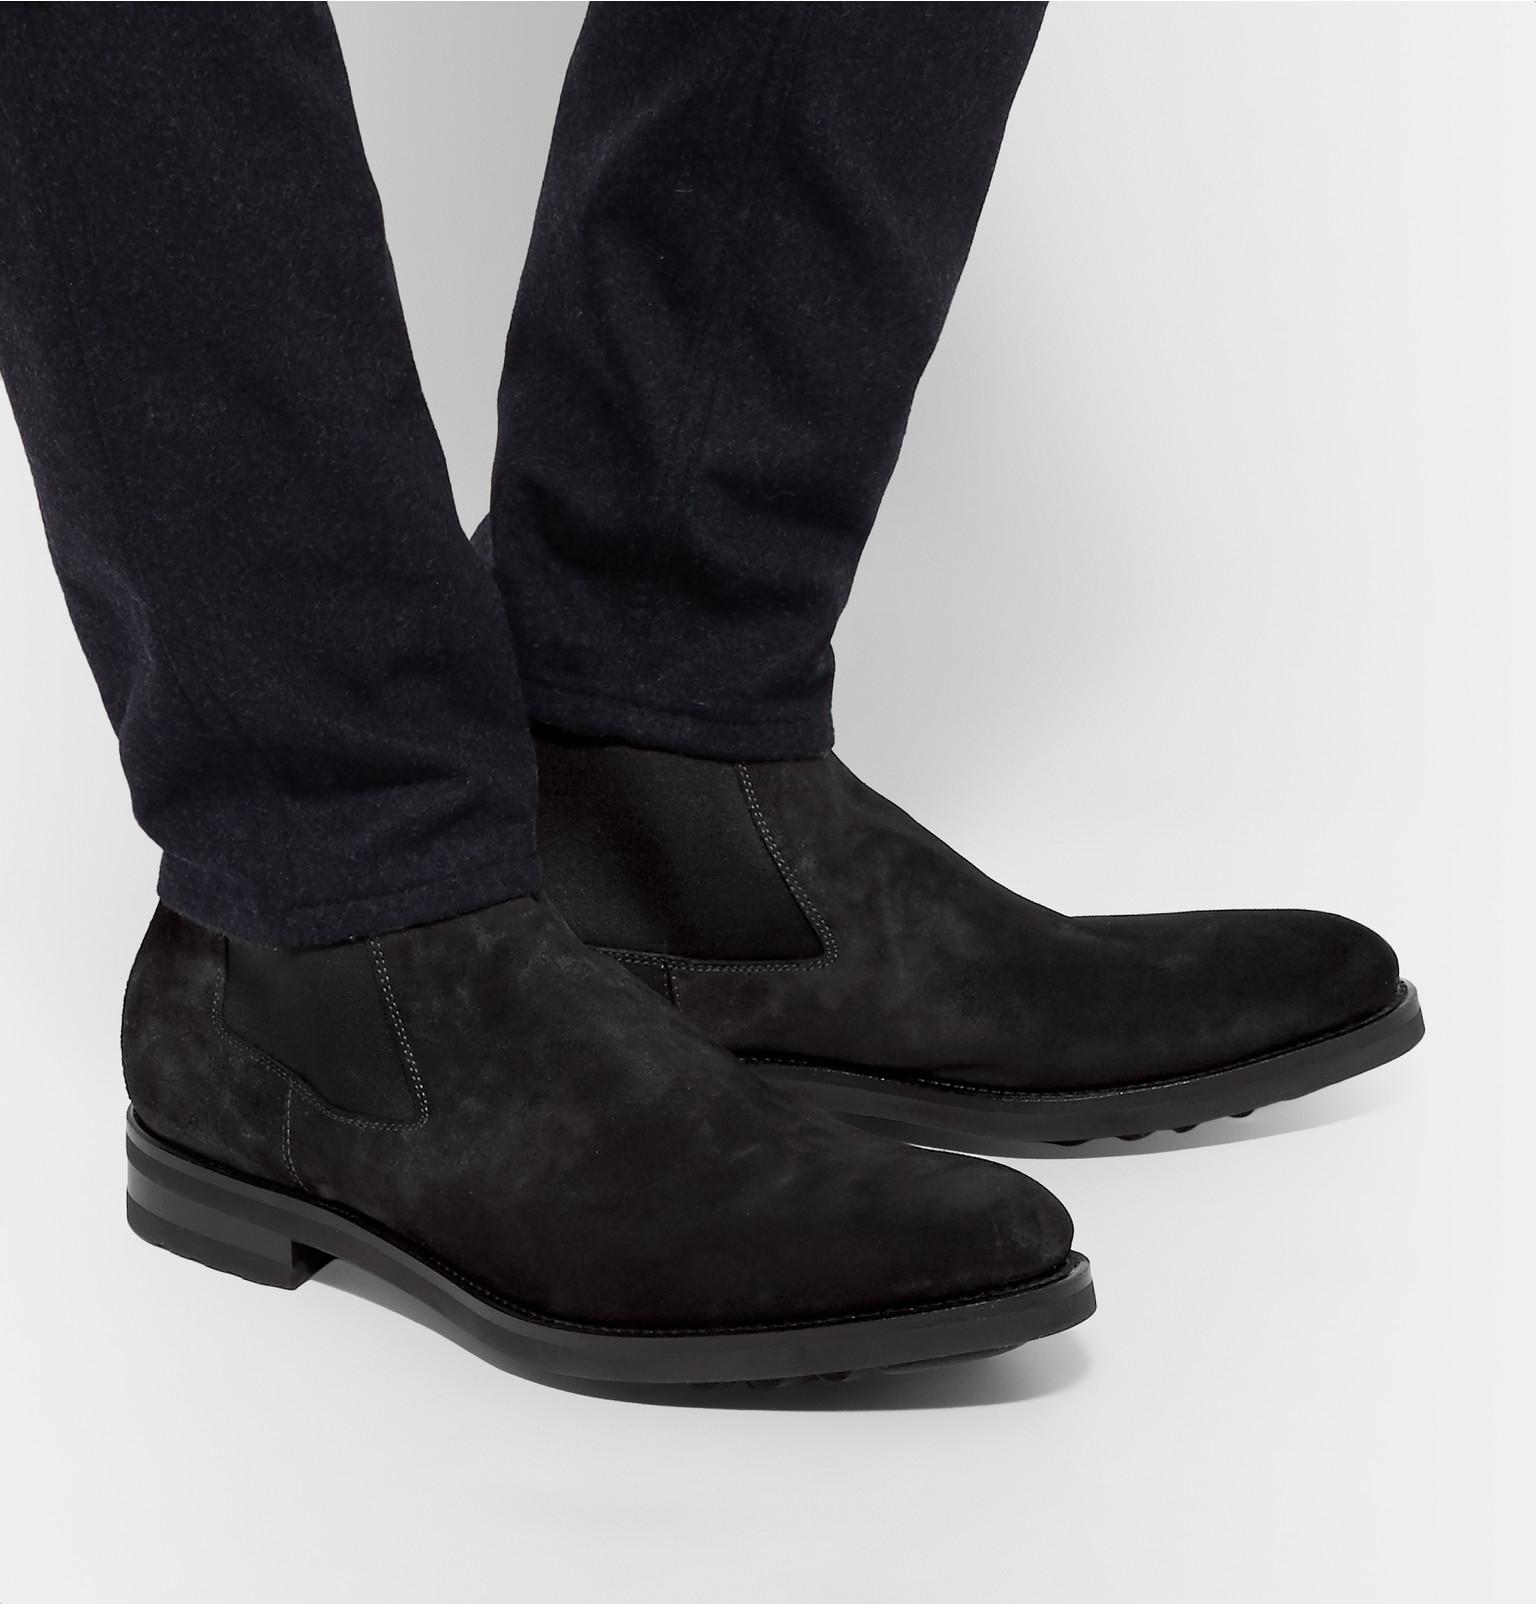 santoni burnished suede chelsea boots in gray for men lyst. Black Bedroom Furniture Sets. Home Design Ideas